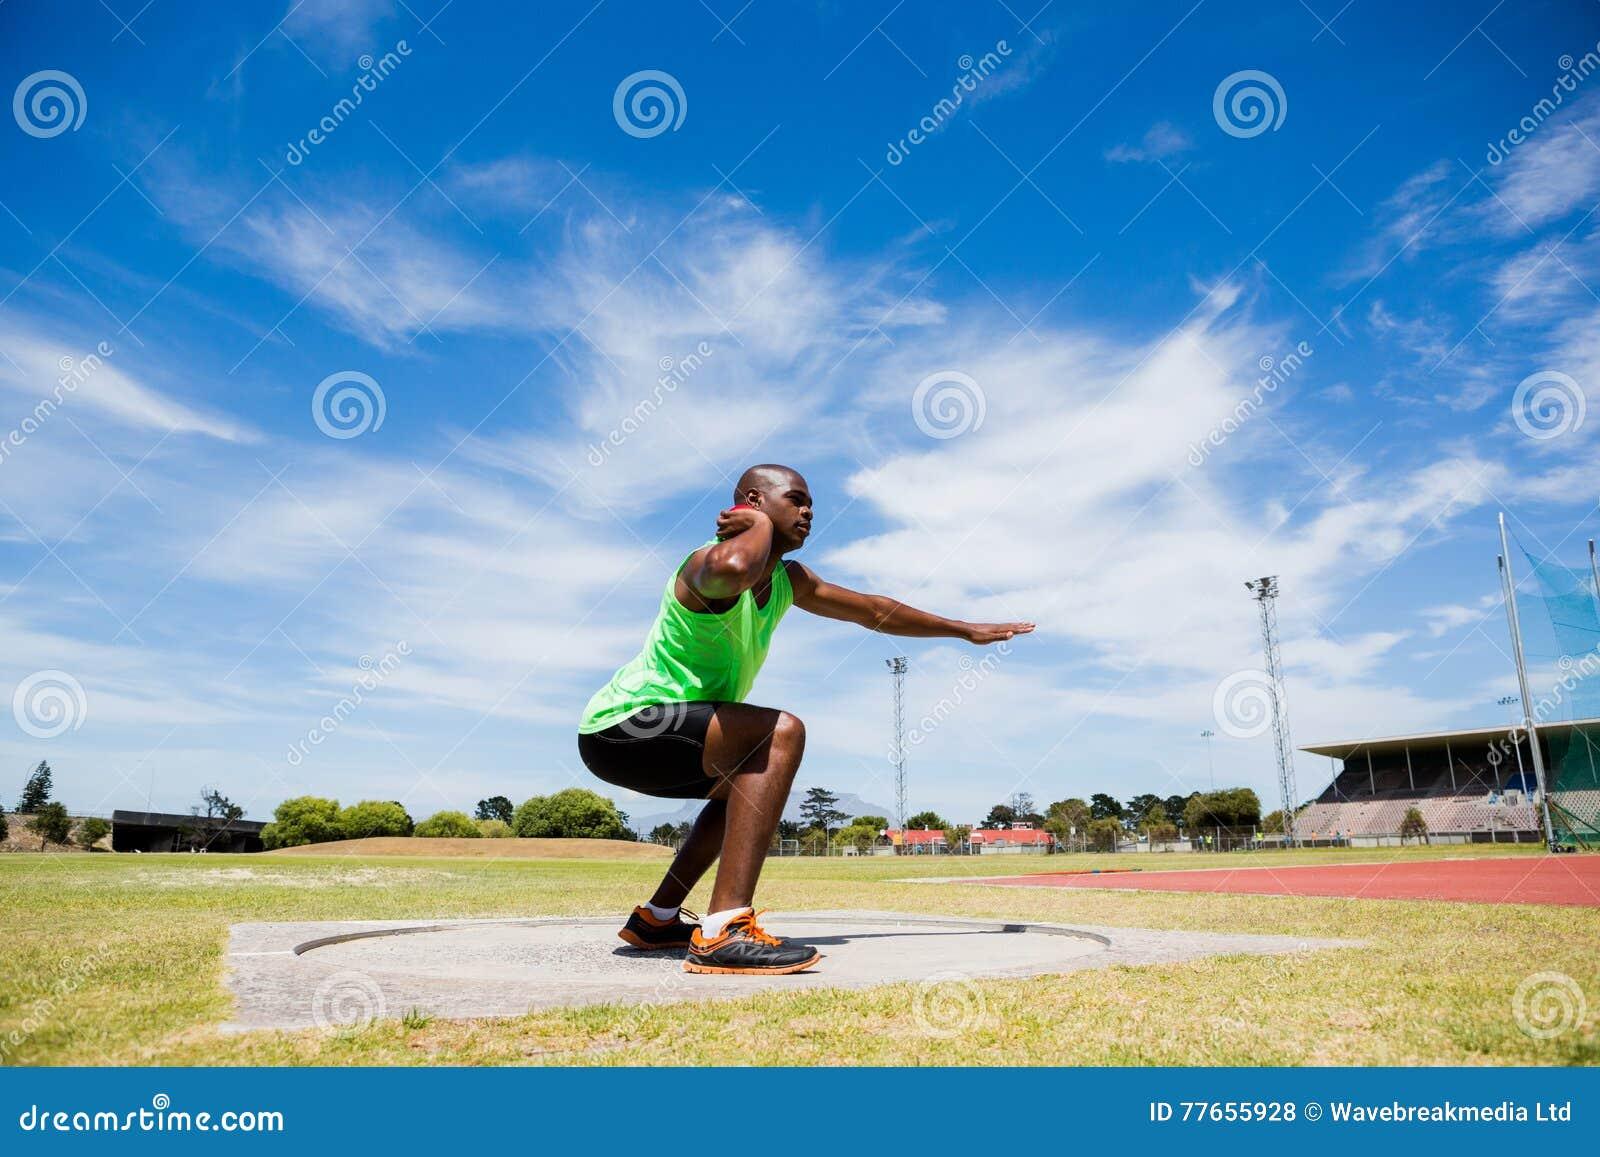 Male athlete preparing to throw shot put ball